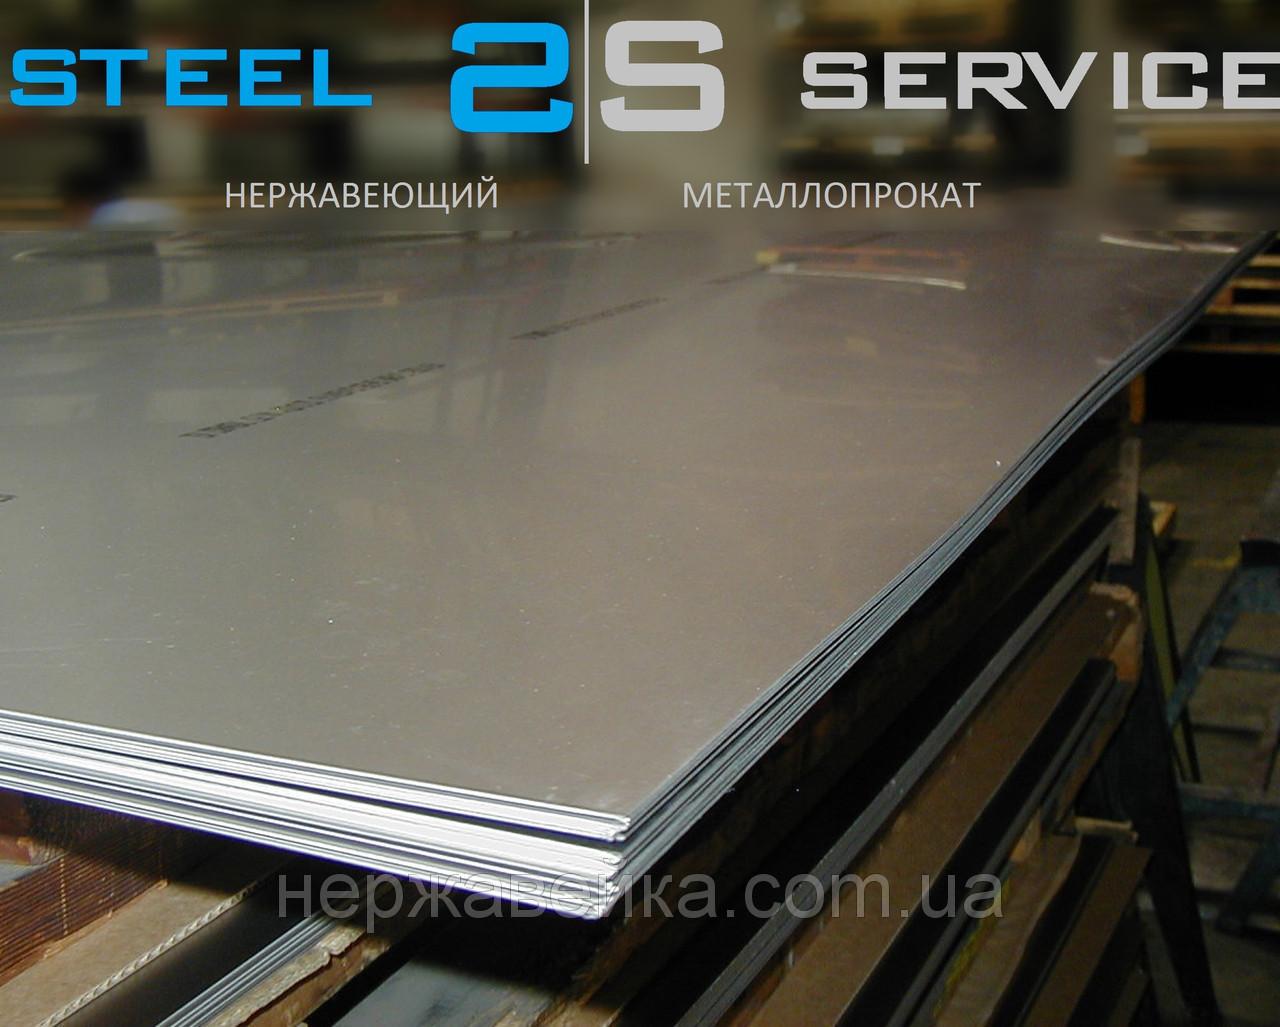 Нержавейка лист 2х1250х2500мм  AISI 316Ti(10Х17Н13М2Т) 2B - матовый,  кислотостойкий